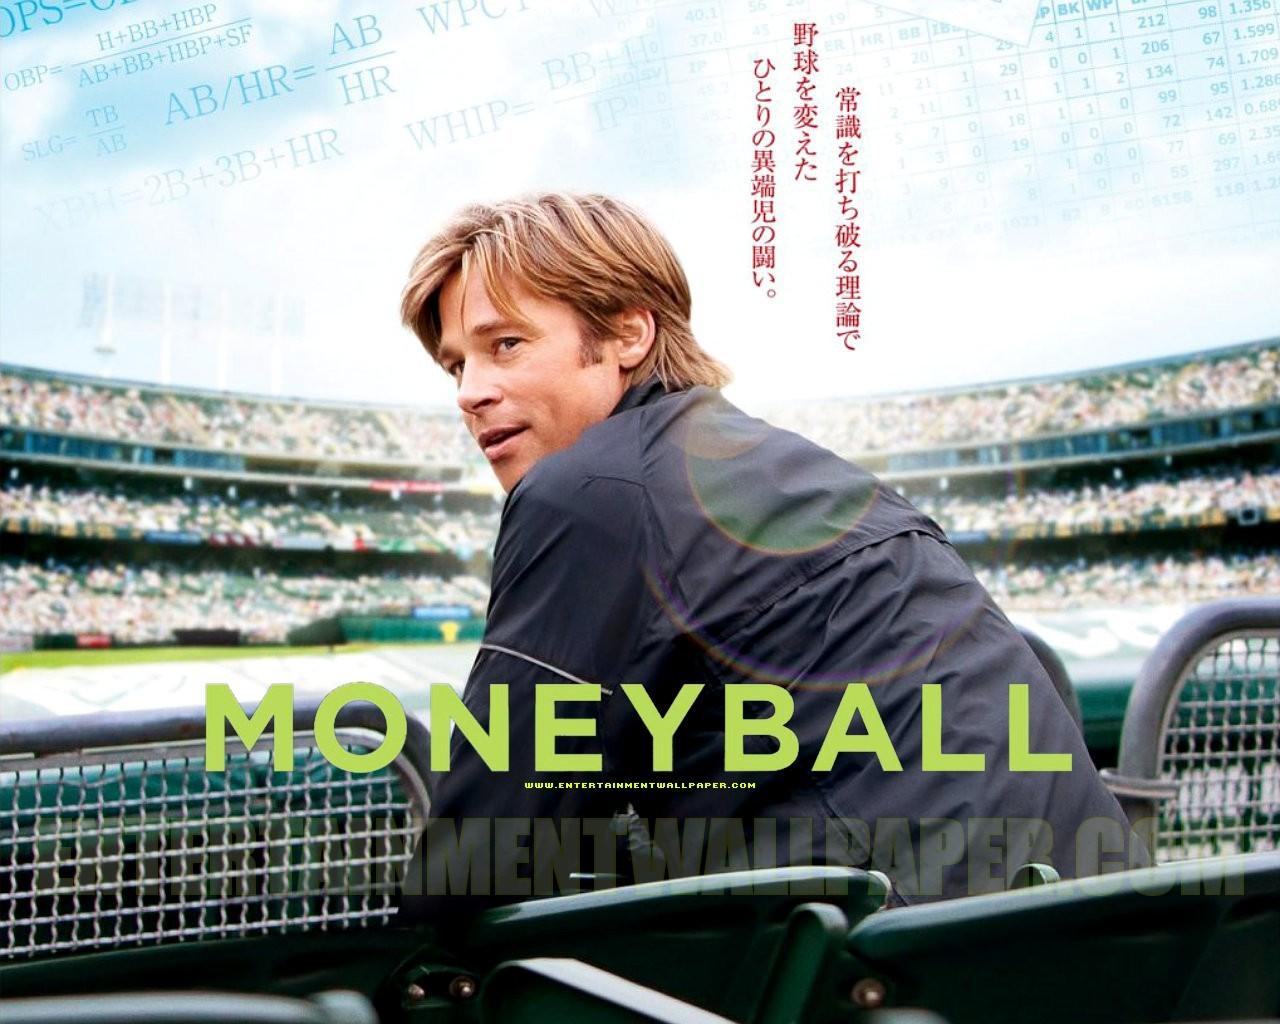 moneyball 魔球